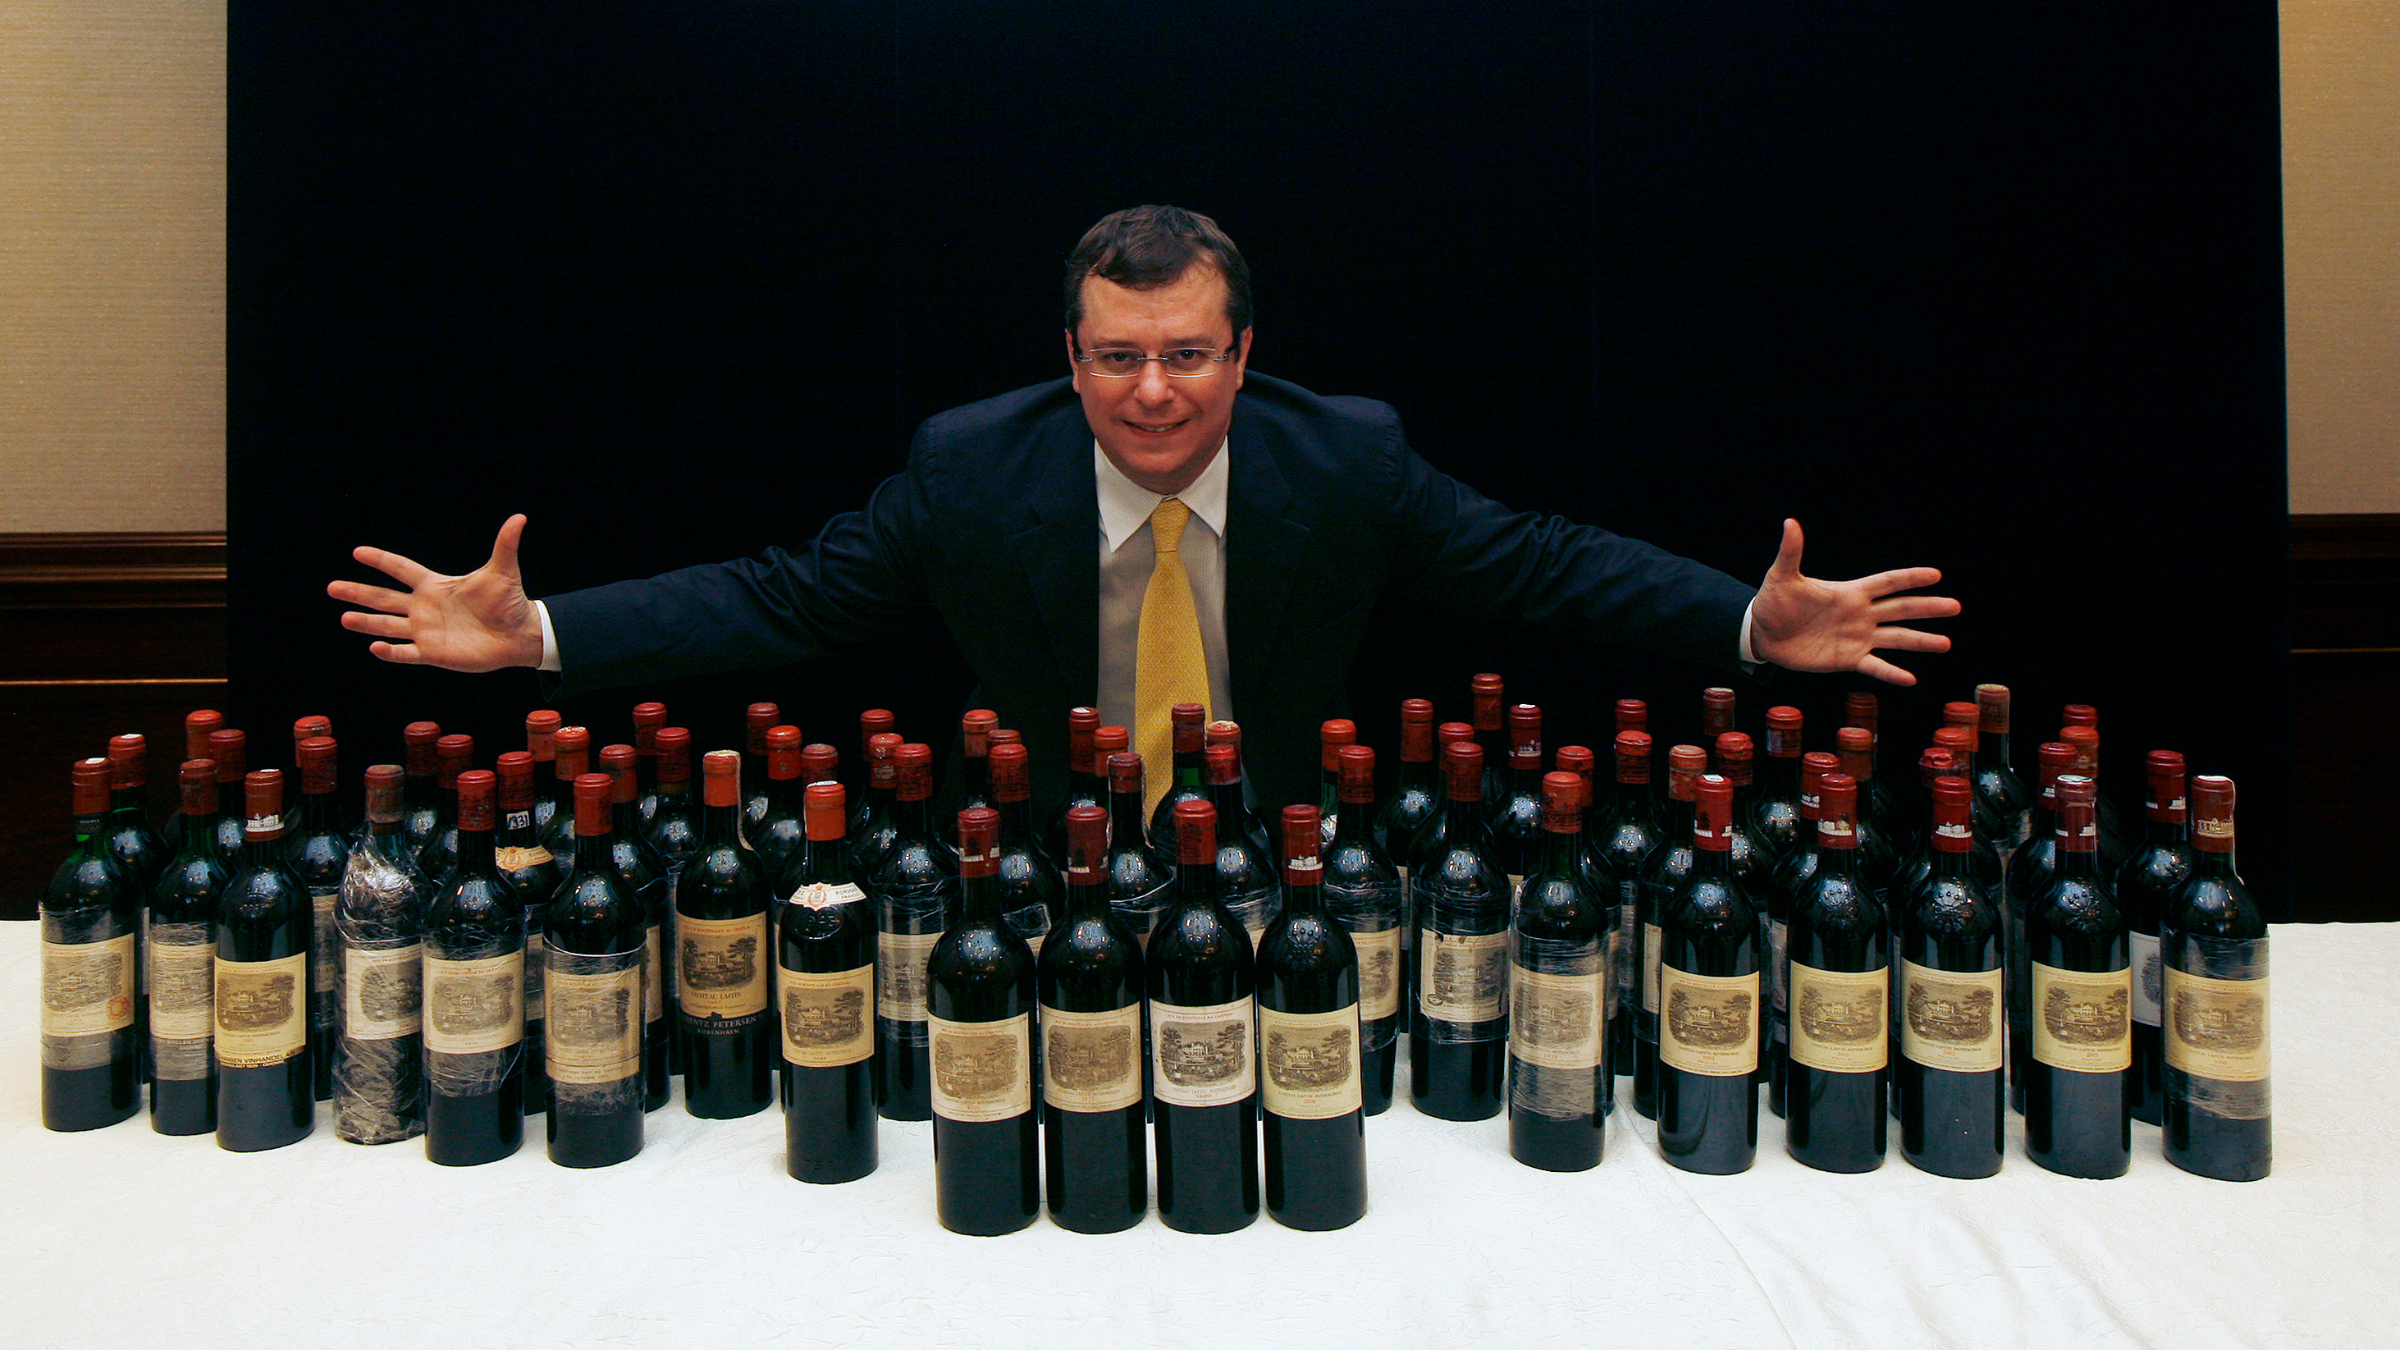 Global wine shortage